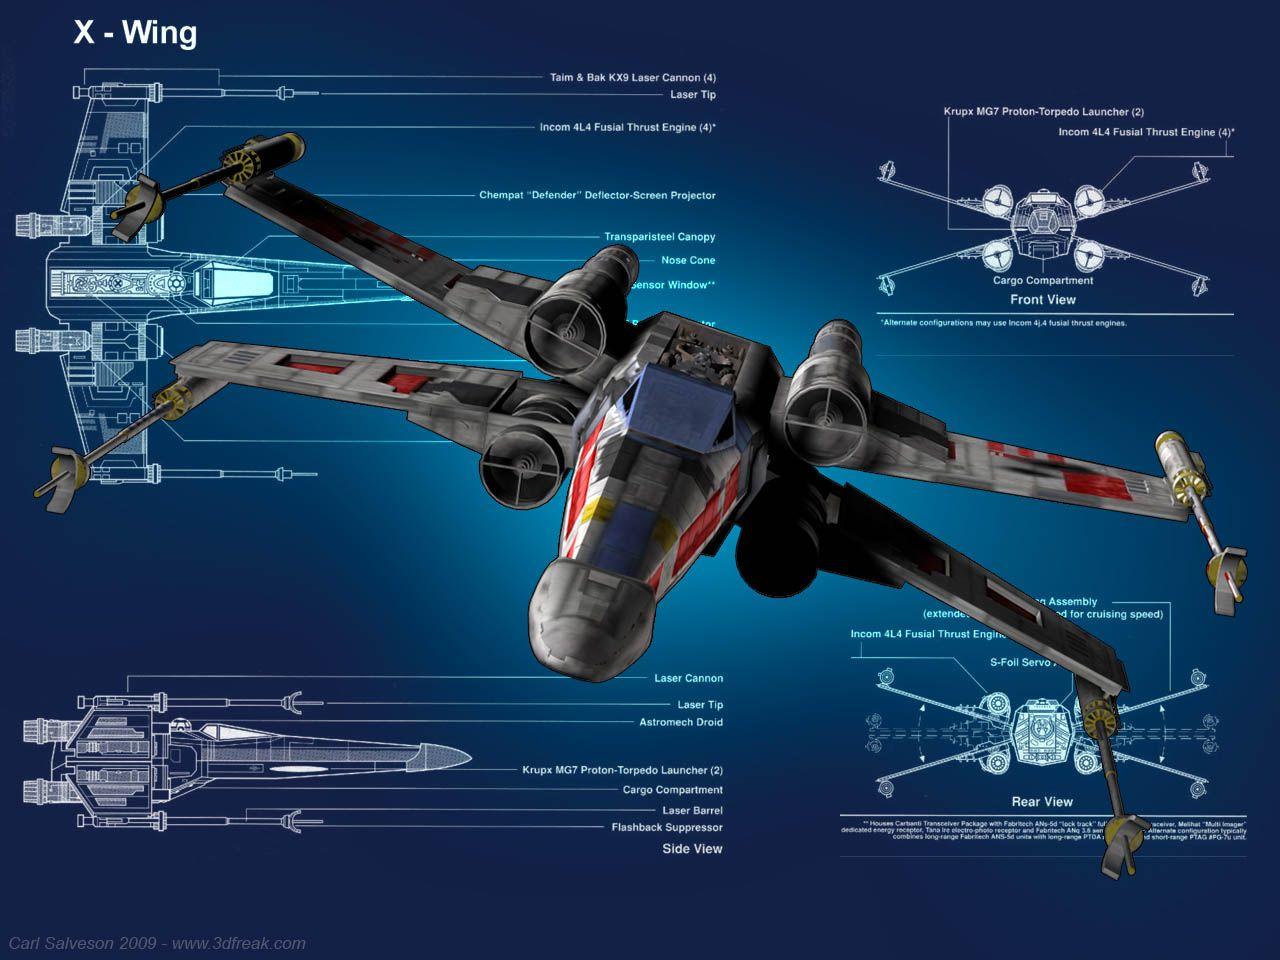 X wing blueprint wallpaper buscar con google buscando y google incom t 65 x wing malvernweather Gallery